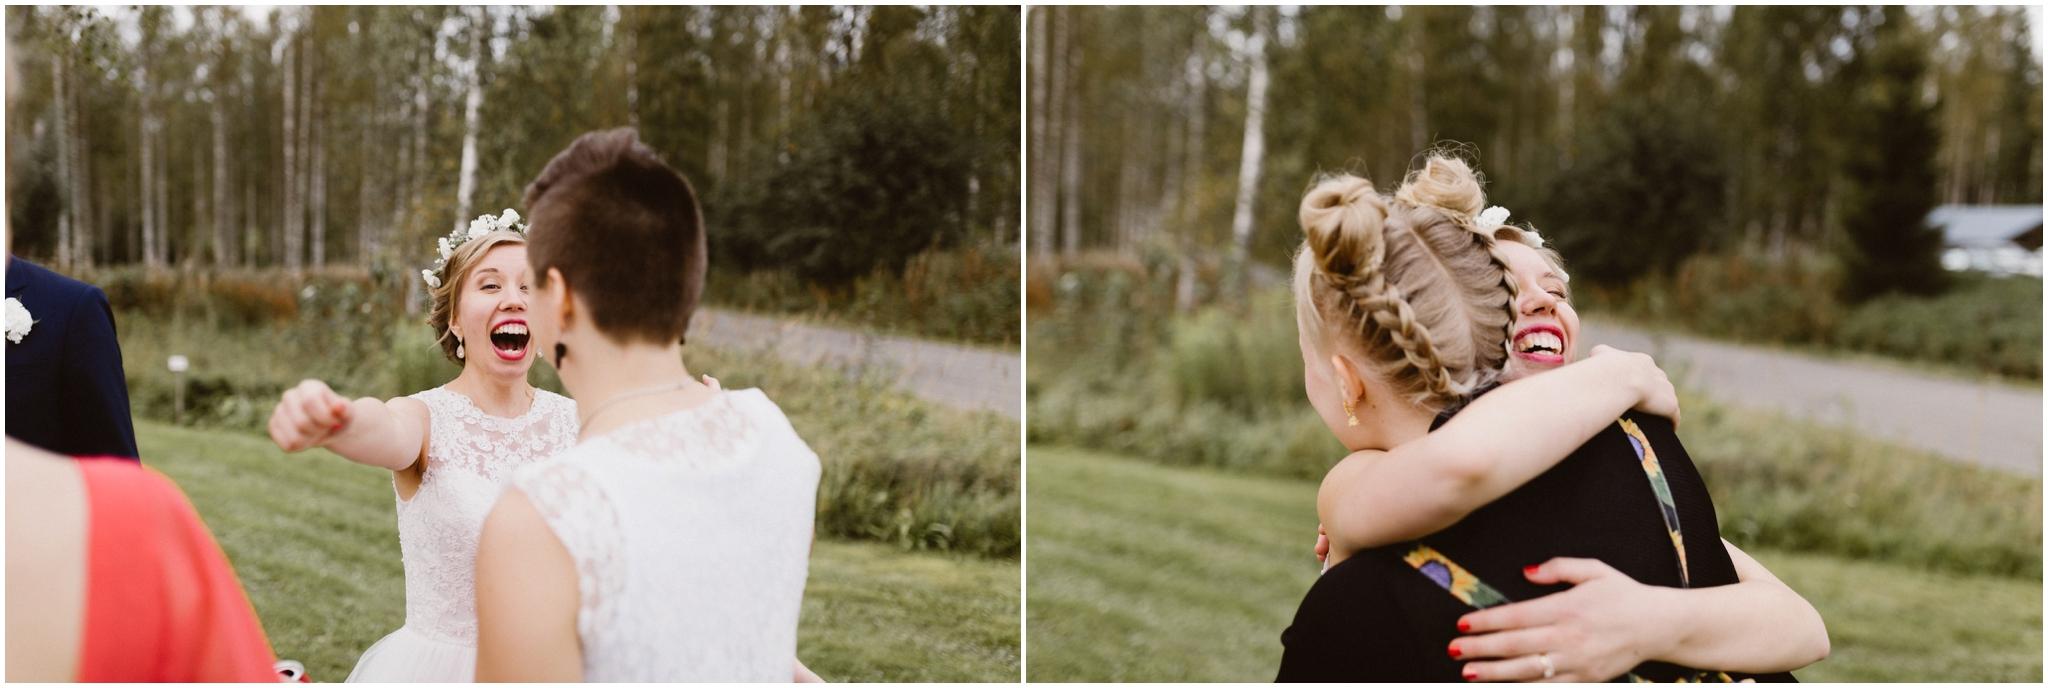 Leevi + Susanna -- Patrick Karkkolainen Wedding Photographer + Adventurer-171.jpg